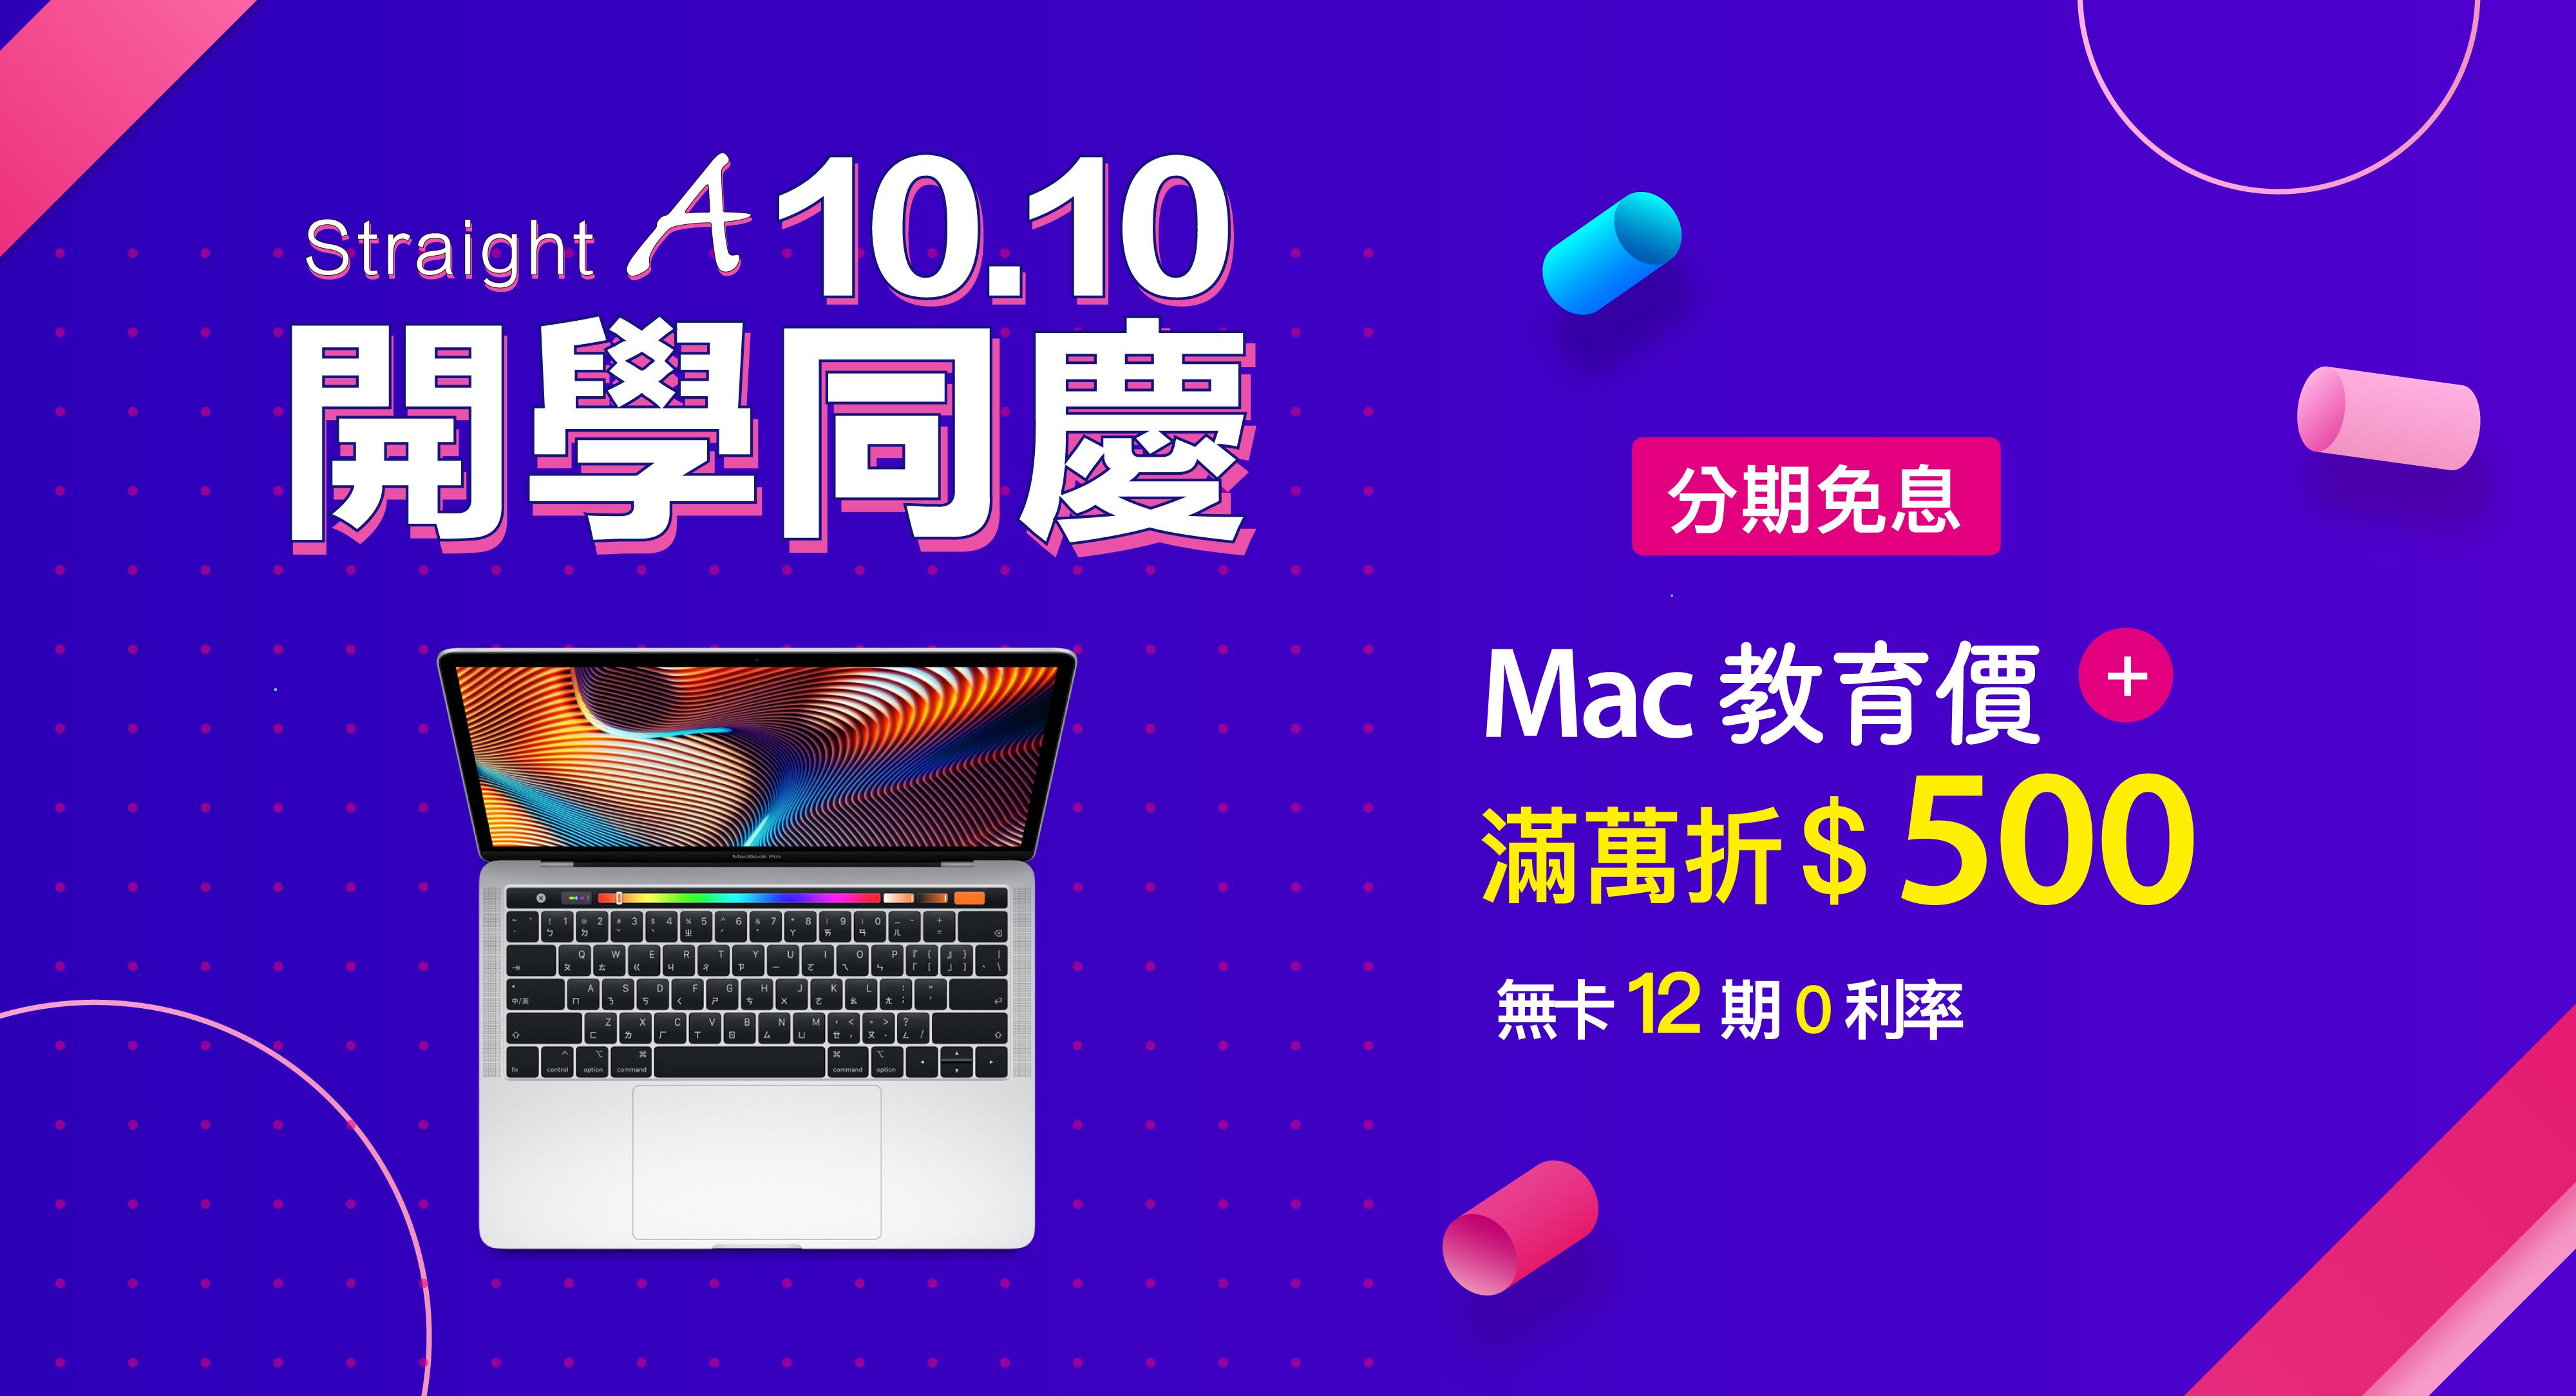 Apple, MacBook Air, 教育價, 滿萬折500, MacBook Pro, 無卡, 零卡分期, 免息